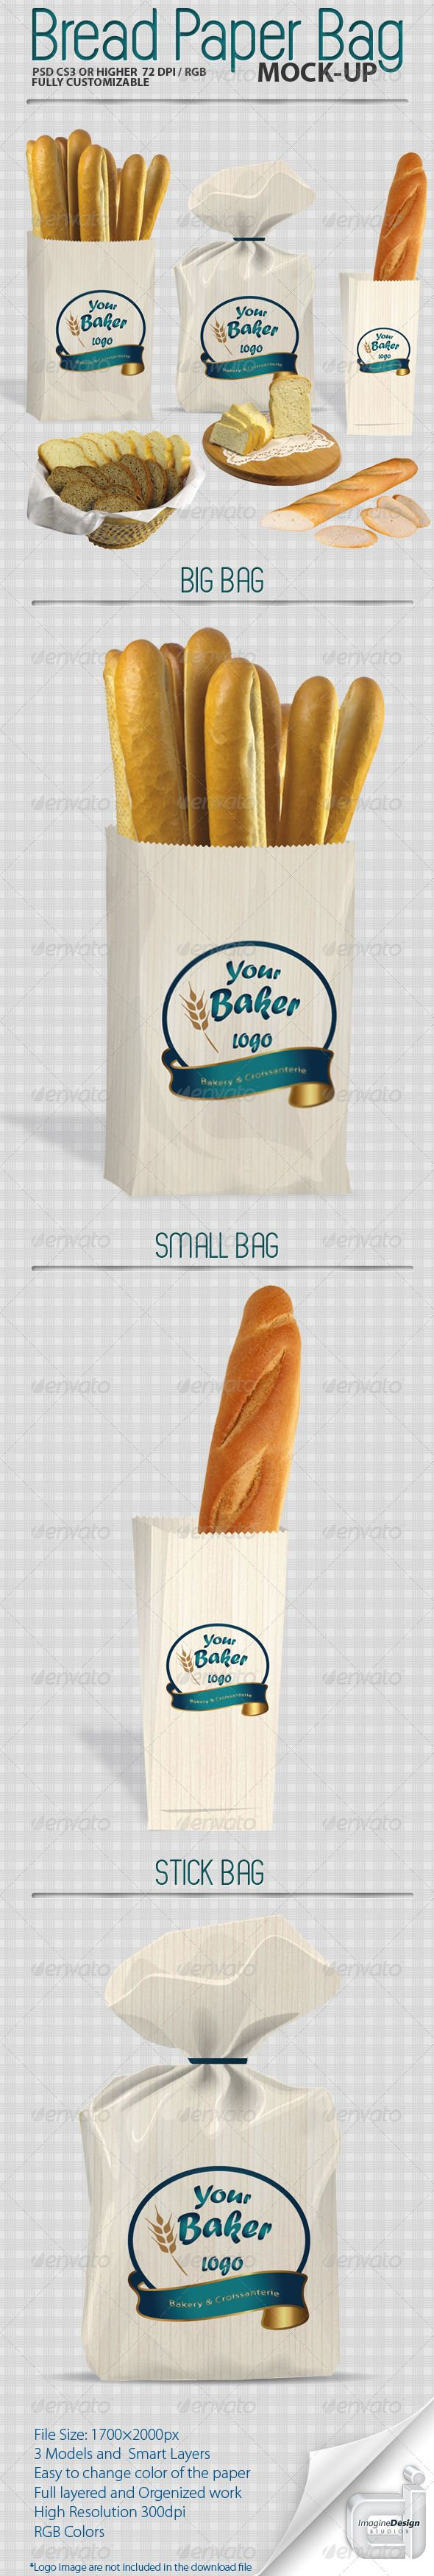 Download Bread Paper Bag Mock Up Mockup Bread And Company Packaging Mockup